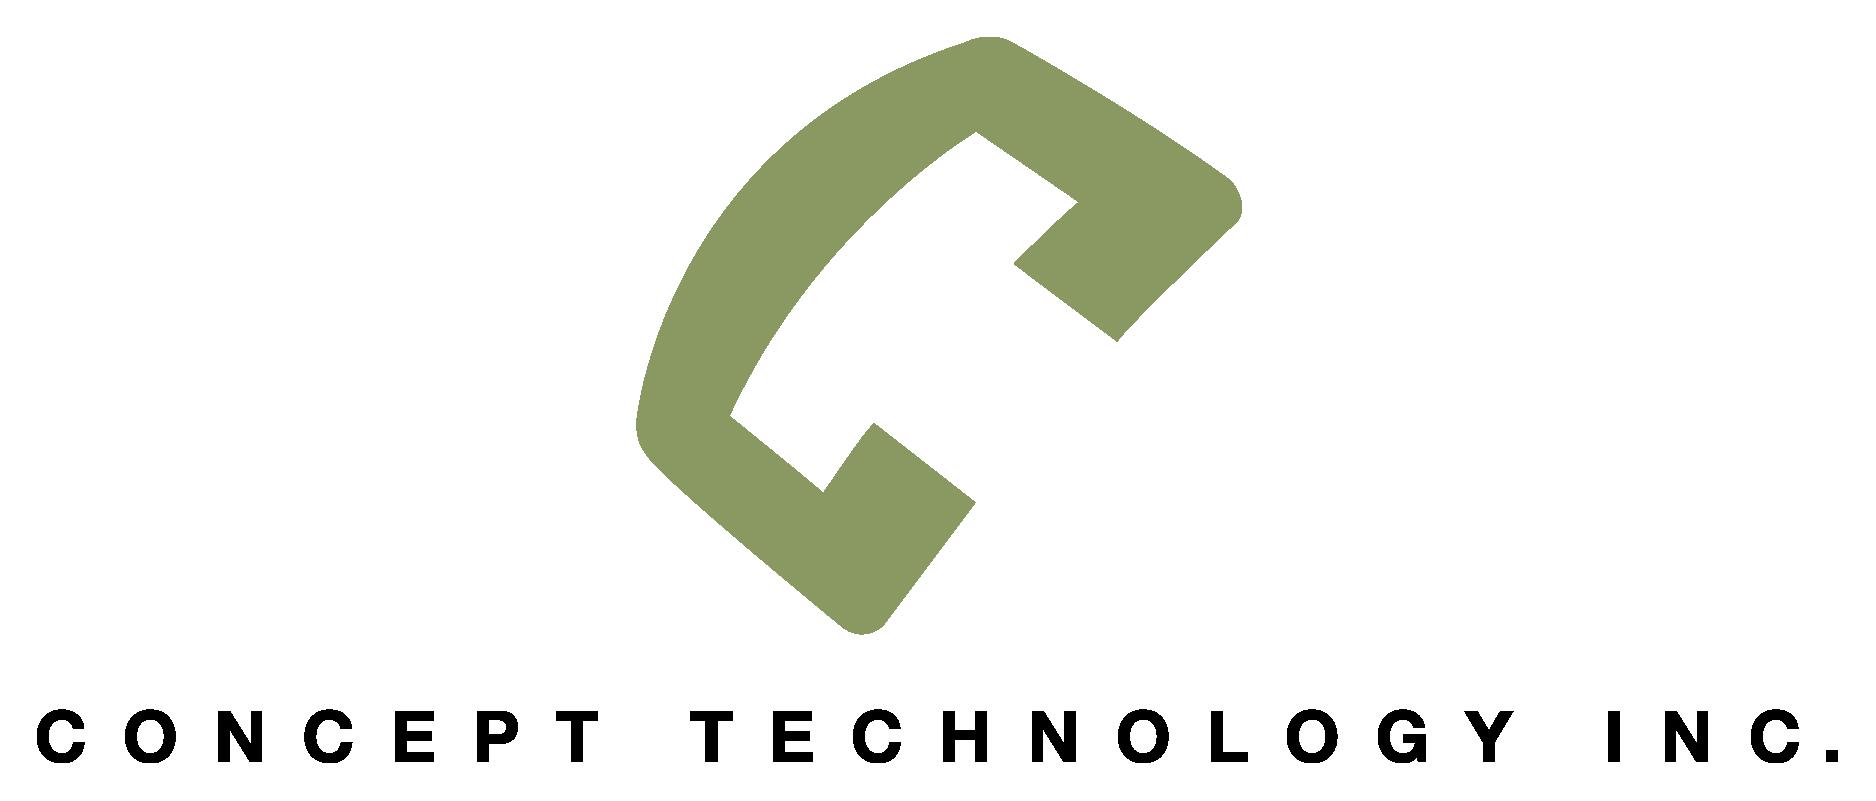 Concept Technology Inc. logo